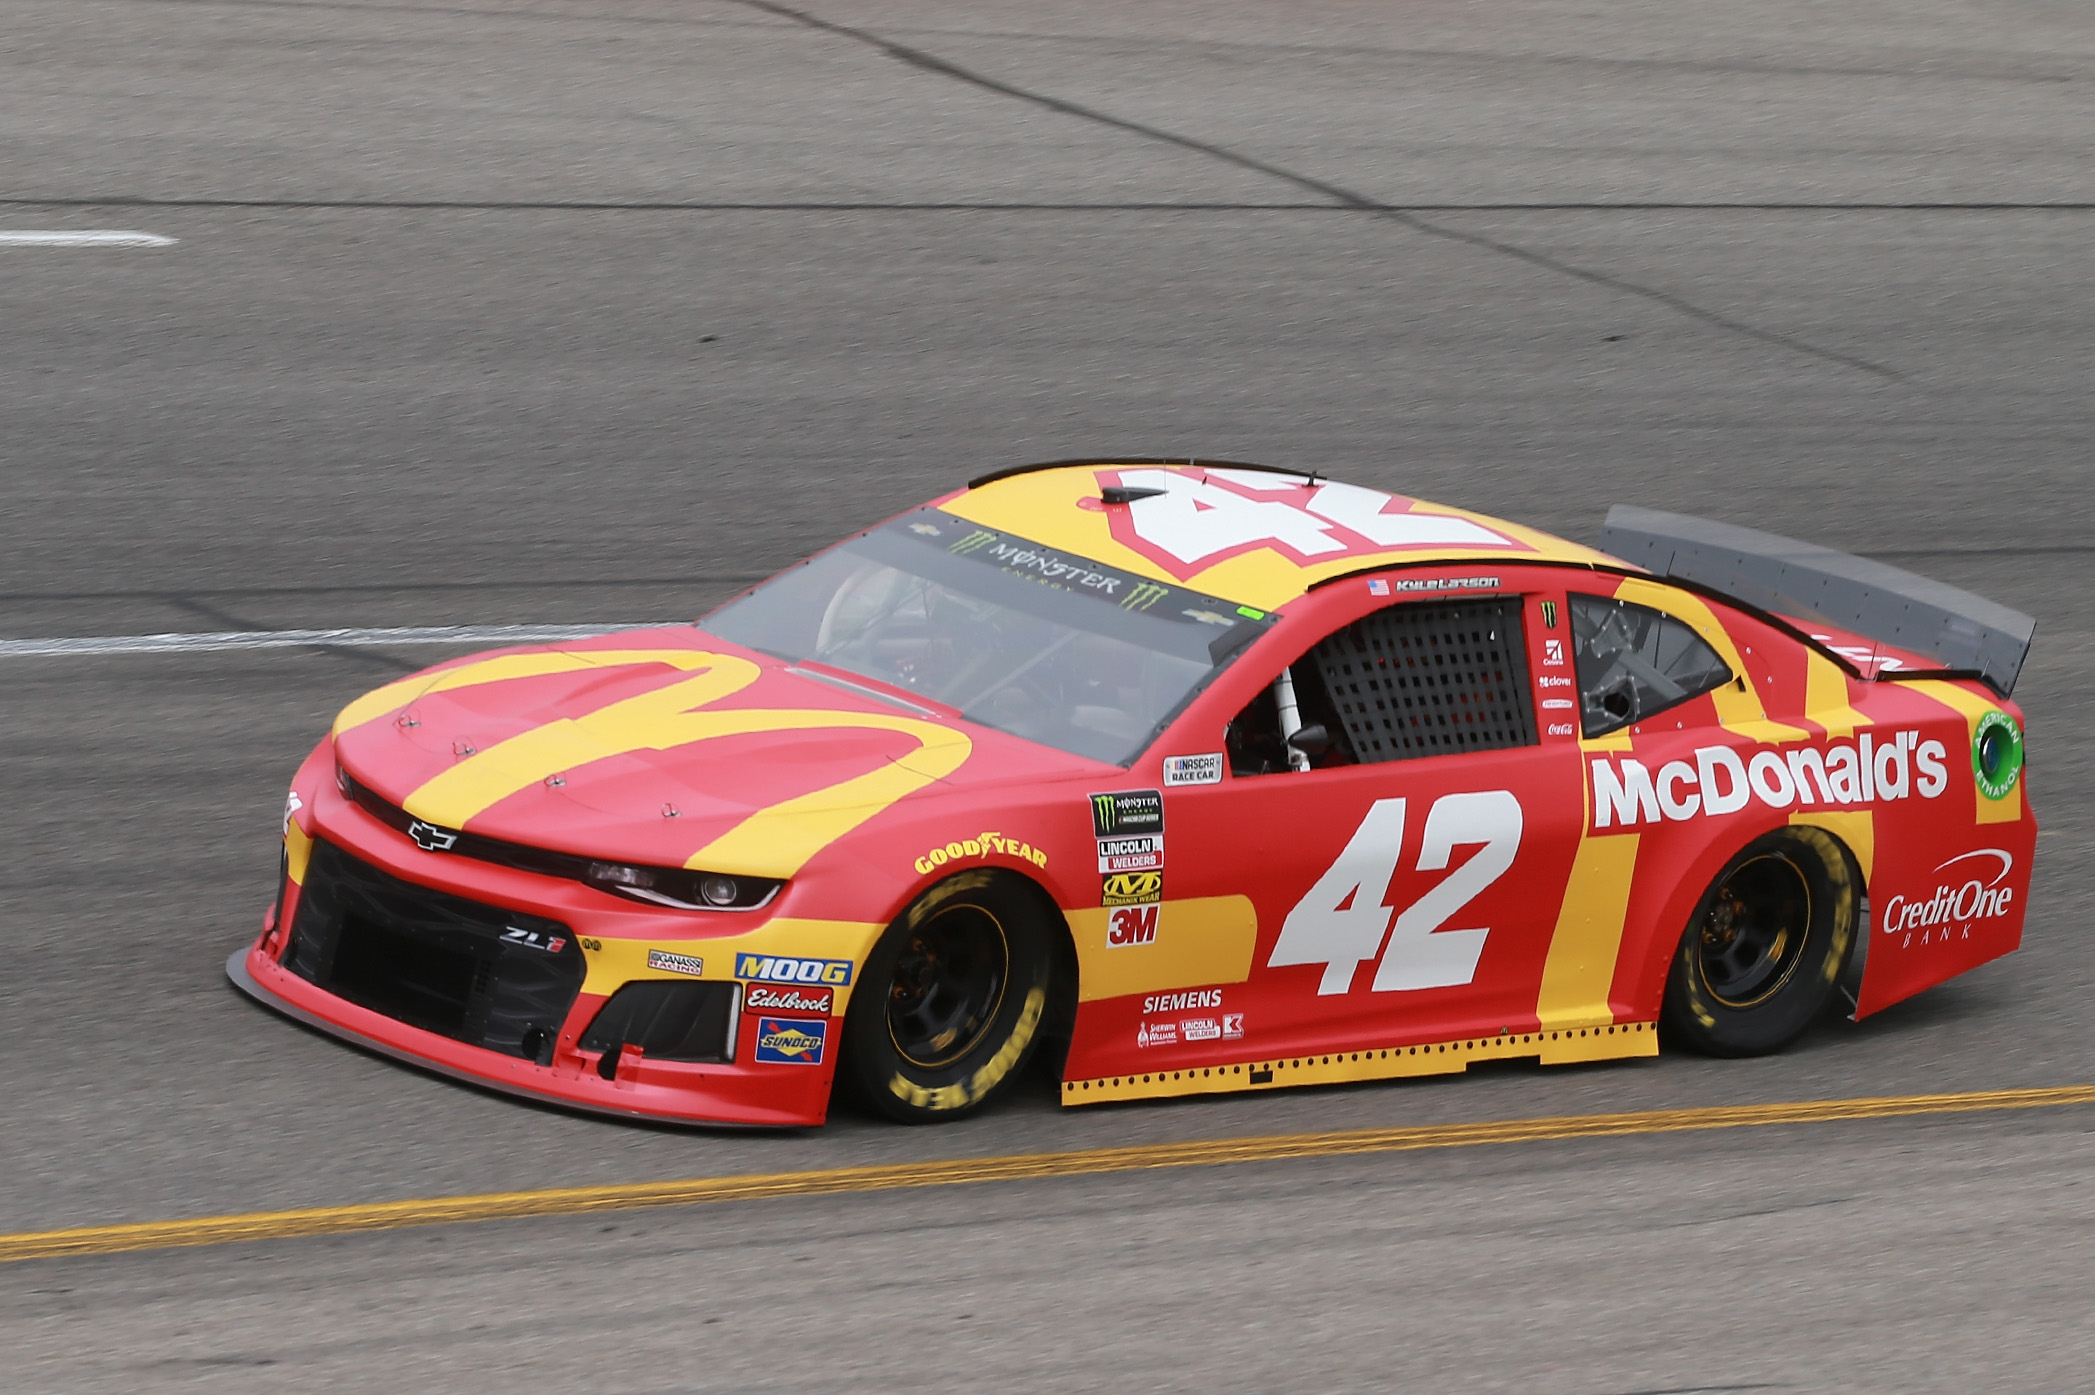 Kyle Larson Ganassi Chevrolet NASCAR